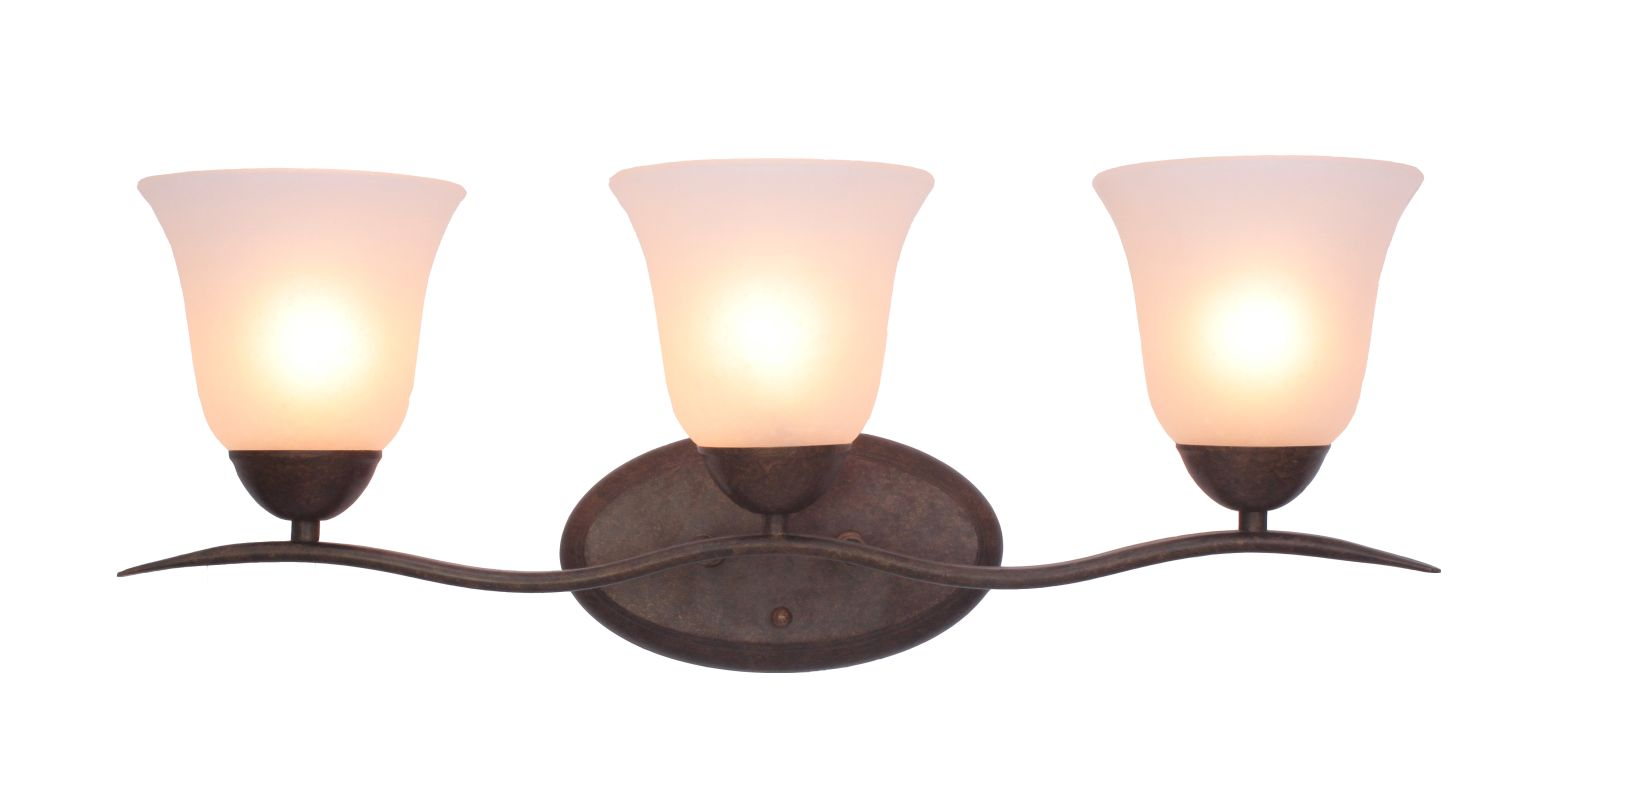 Woodbridge Lighting 50052 Beaconsfield 3 Light Vanity Light Marbled